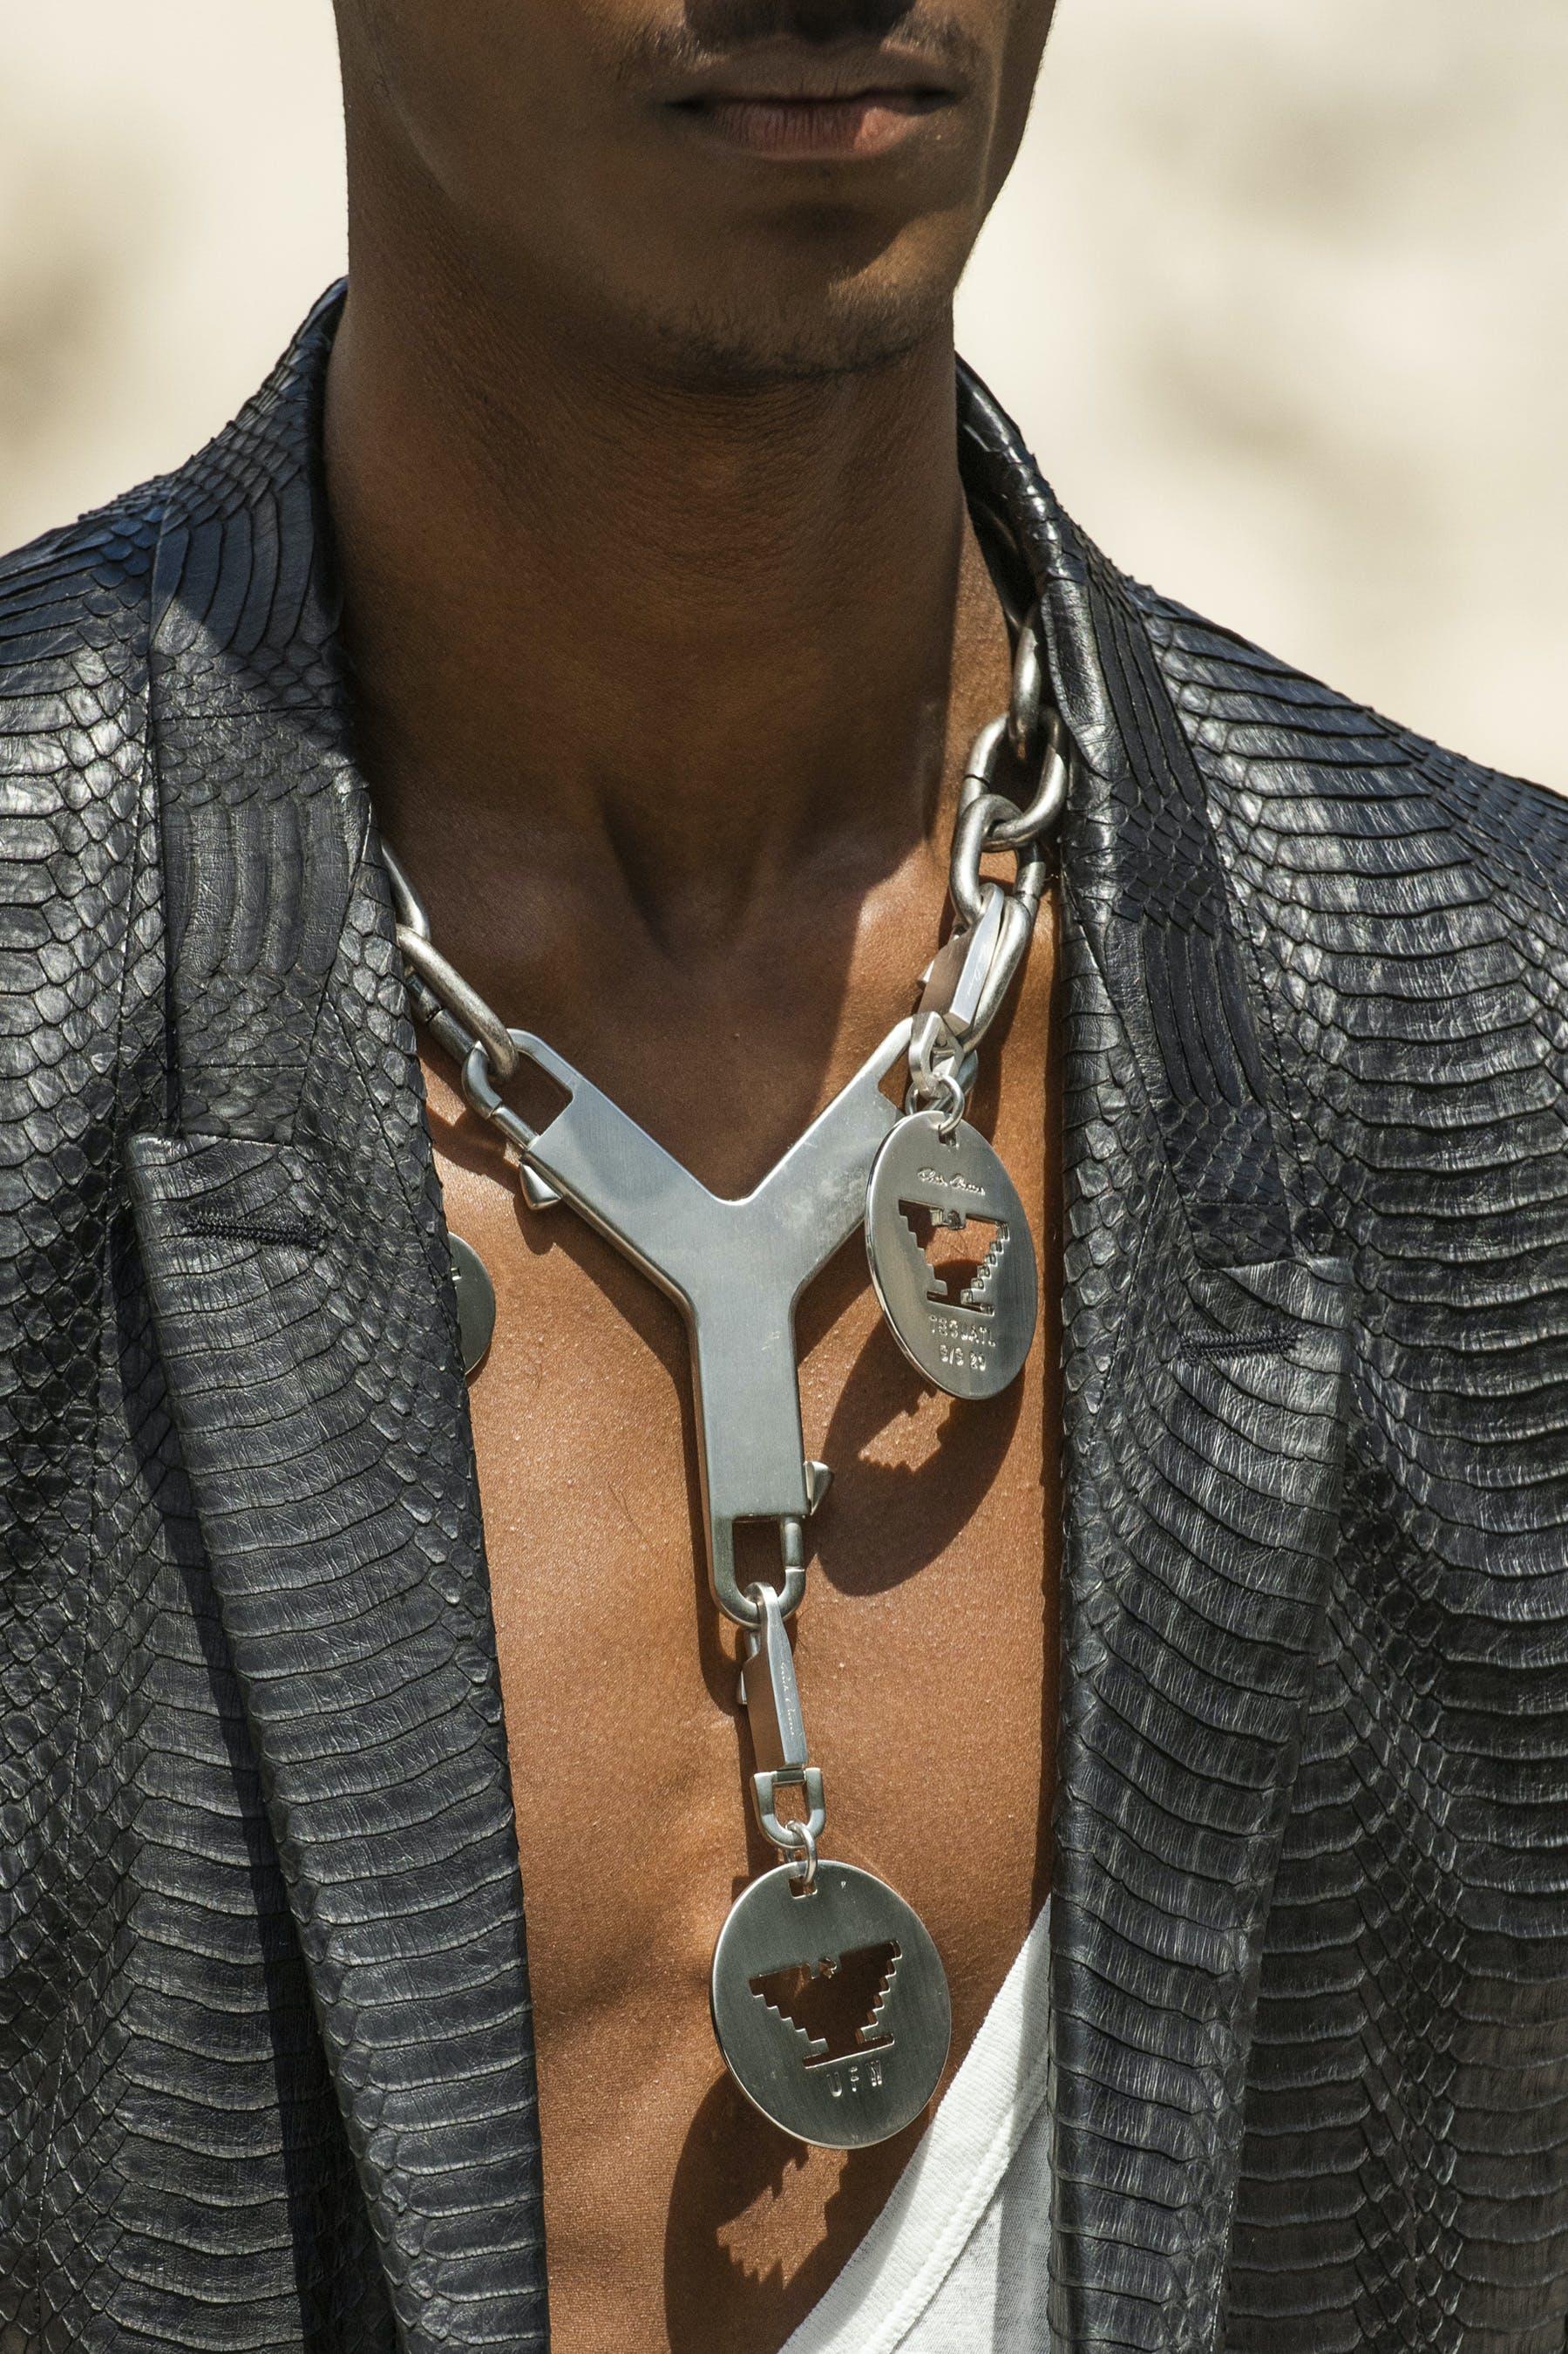 Rick Owens Runway Details Tatlin Blazer in Black Snake Skin Leather Chain Necklace Cerberus Key Chain UFW Logo Mens SS20 Tecautl